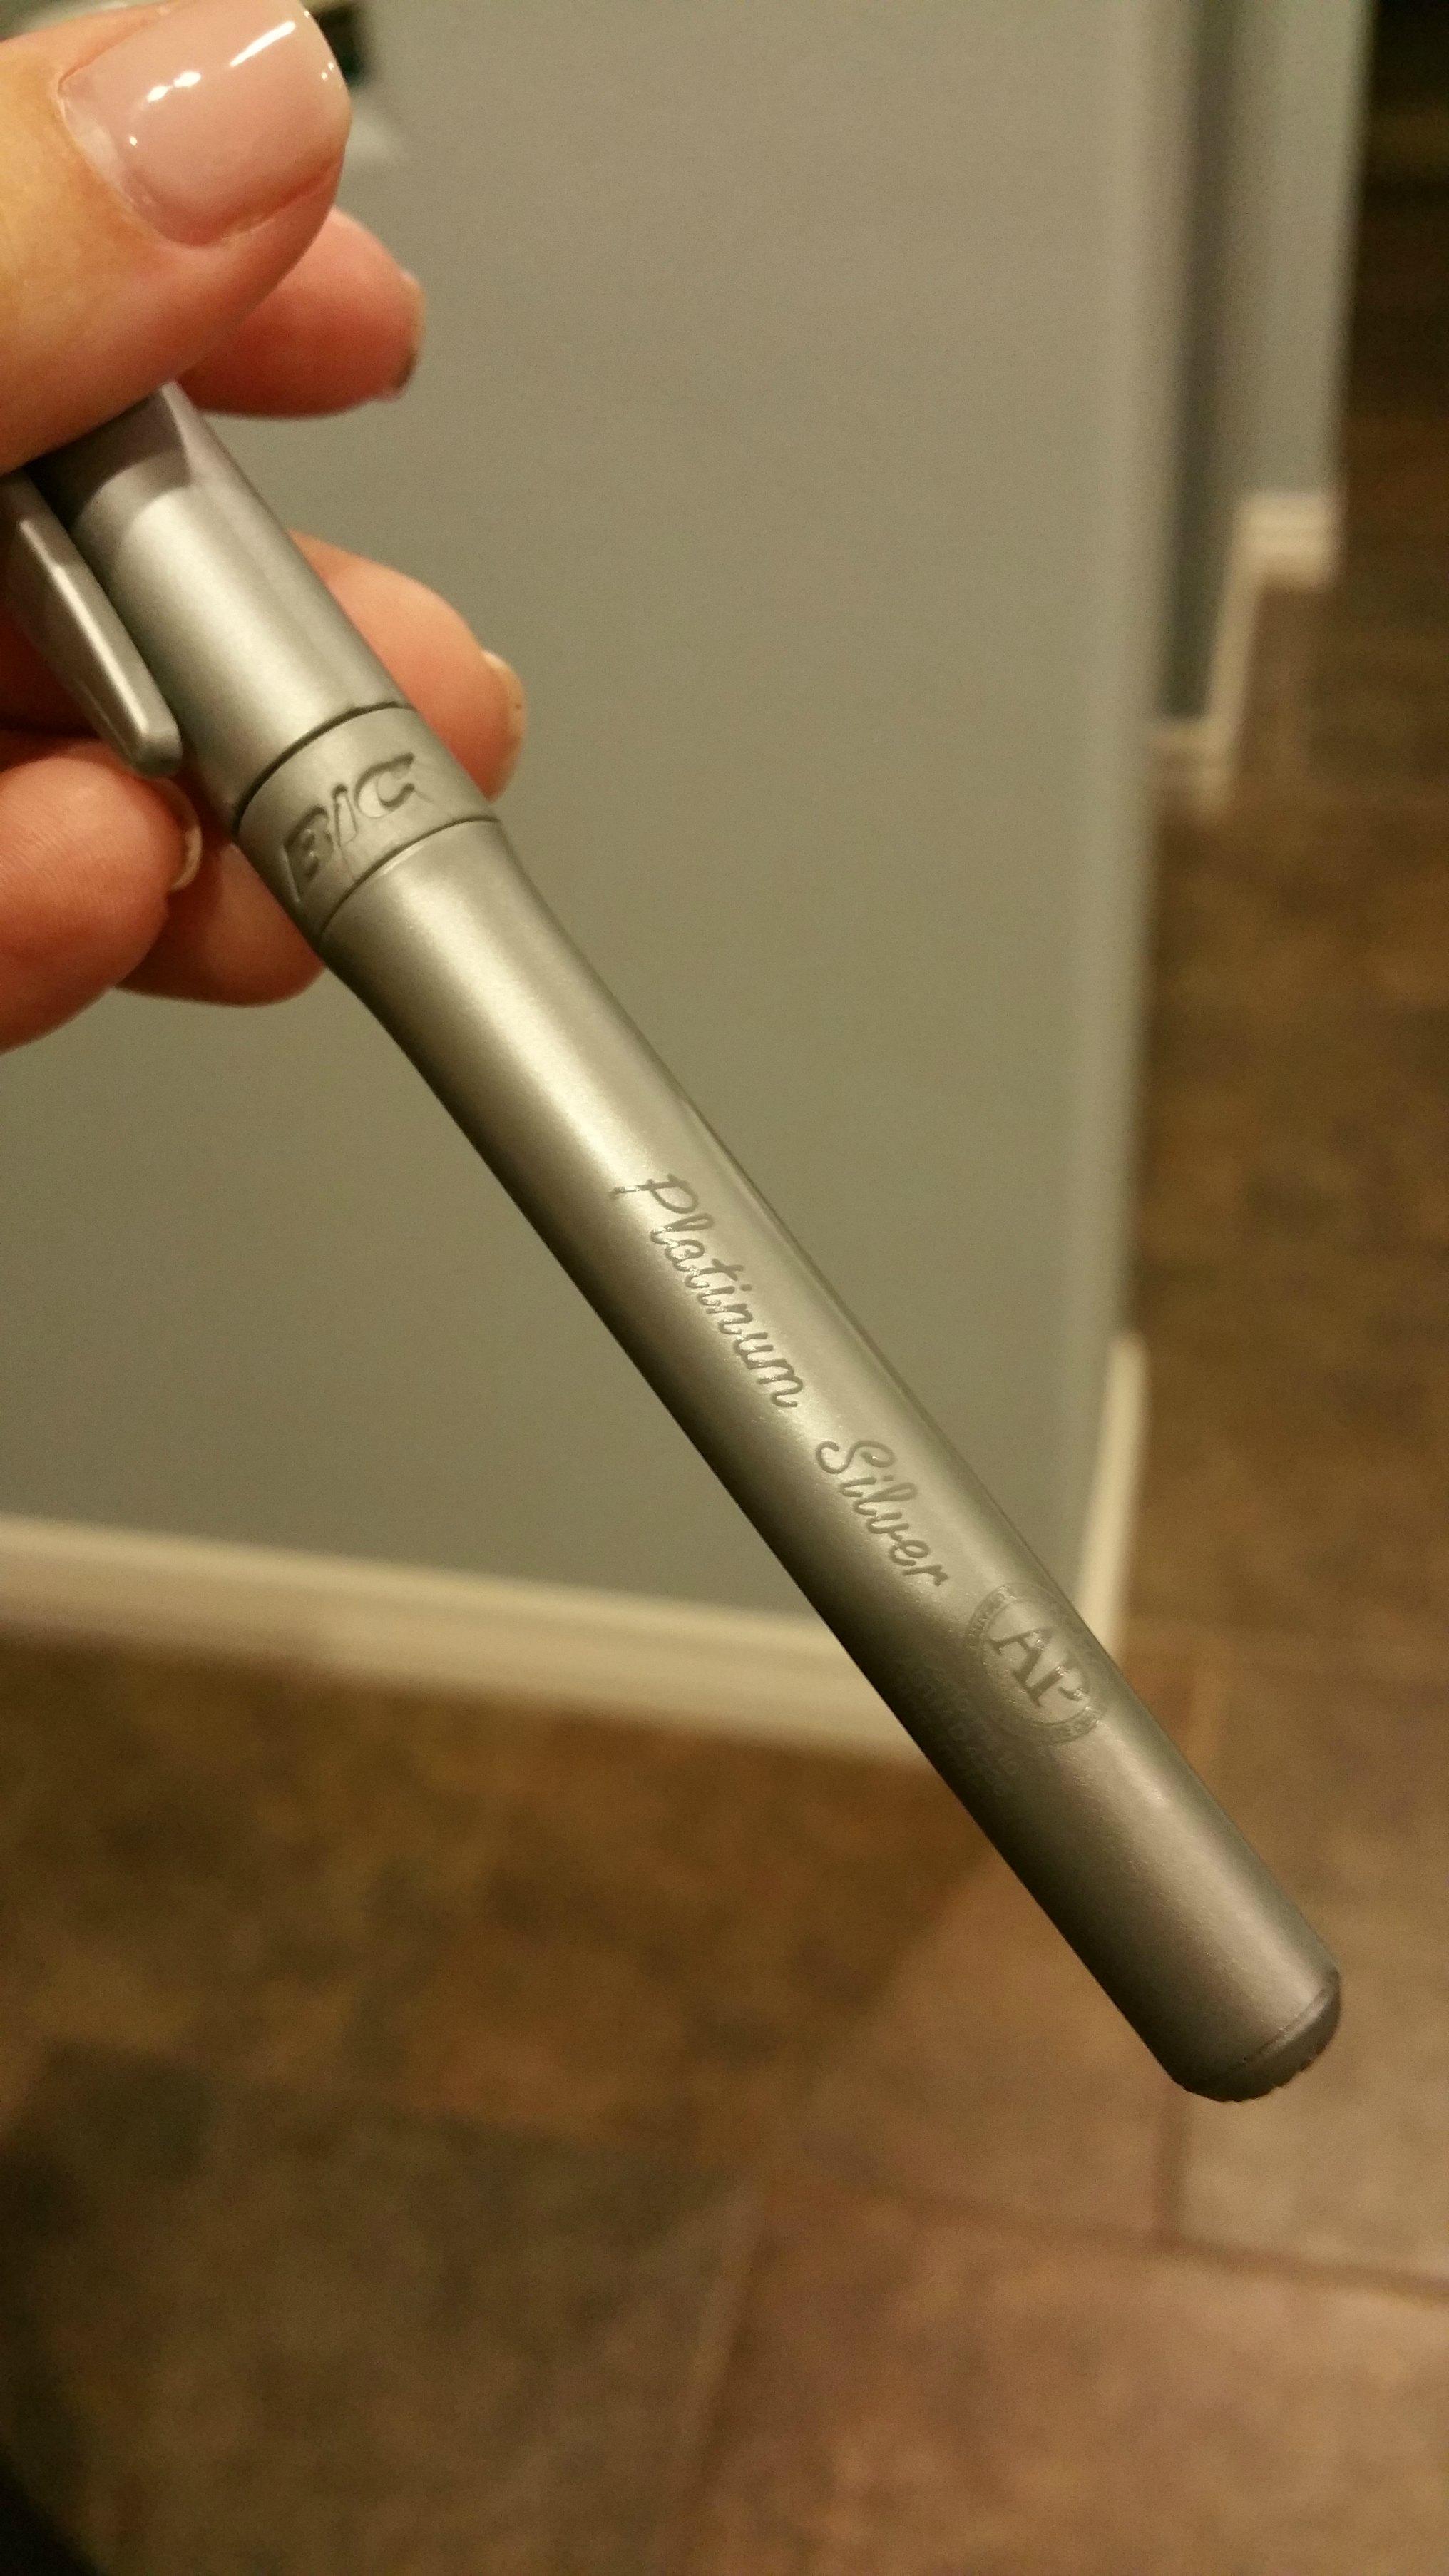 bic platinum silver marker